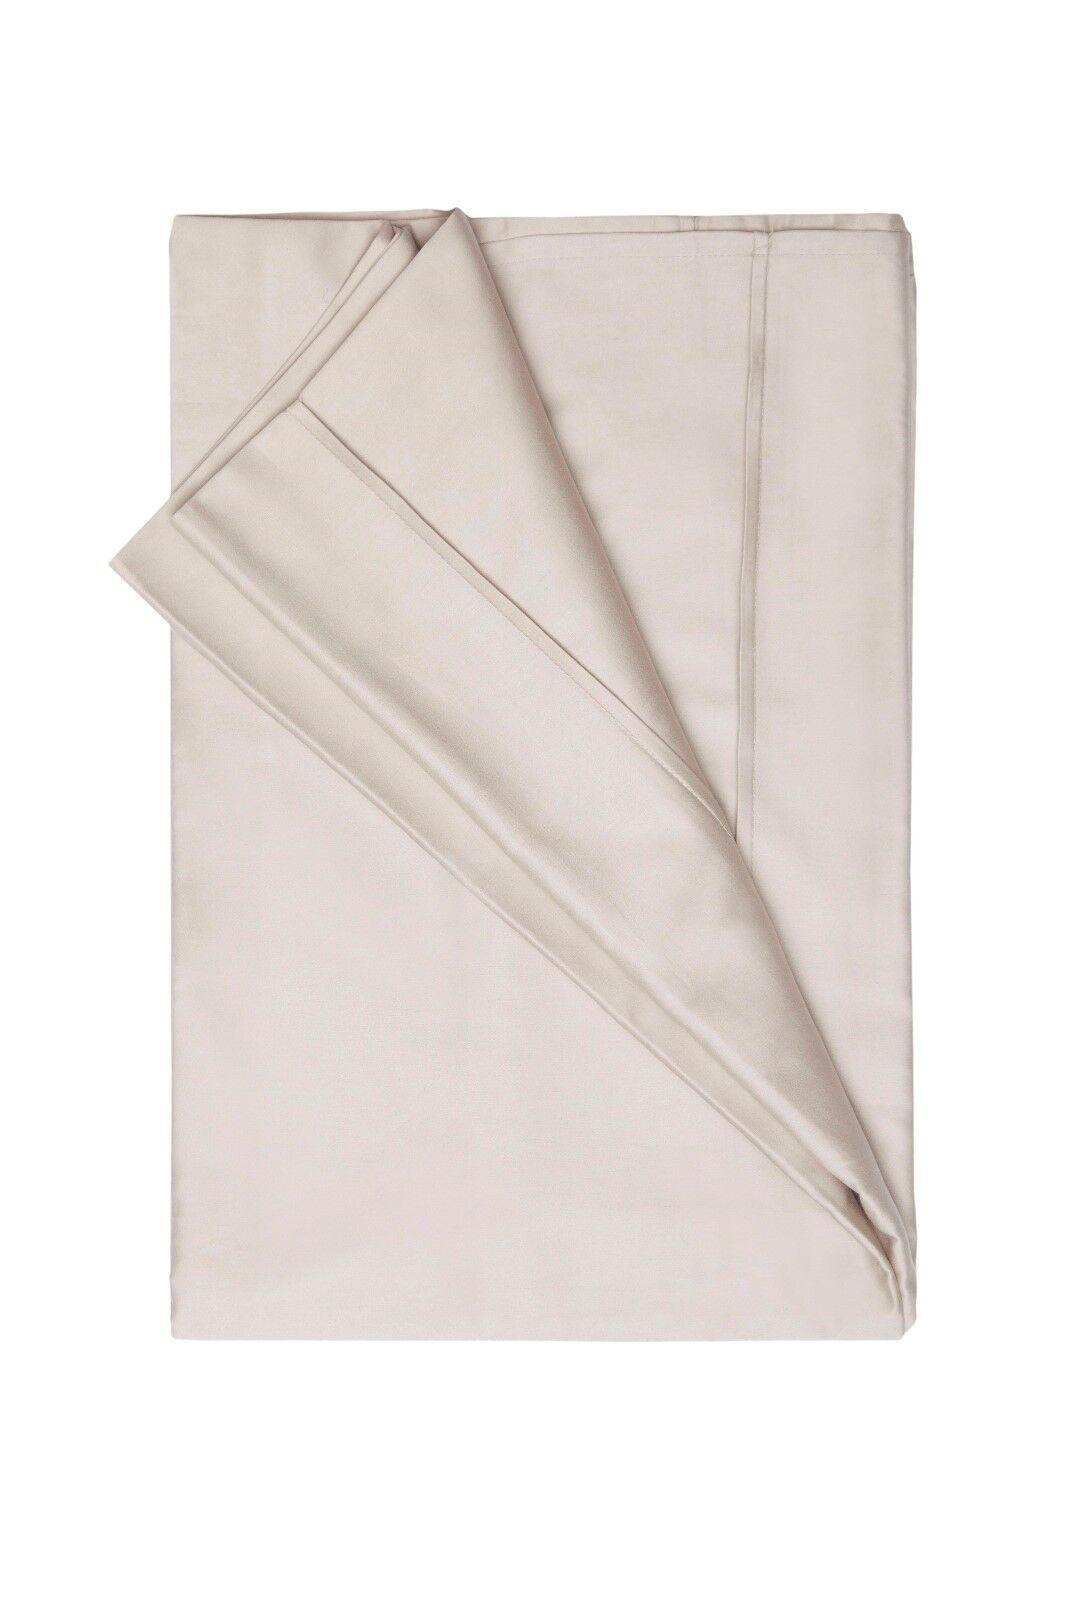 450Thread Count Pima Cotton Flat Sheet in Oyster 180cm x 260cm Single Bed Größe